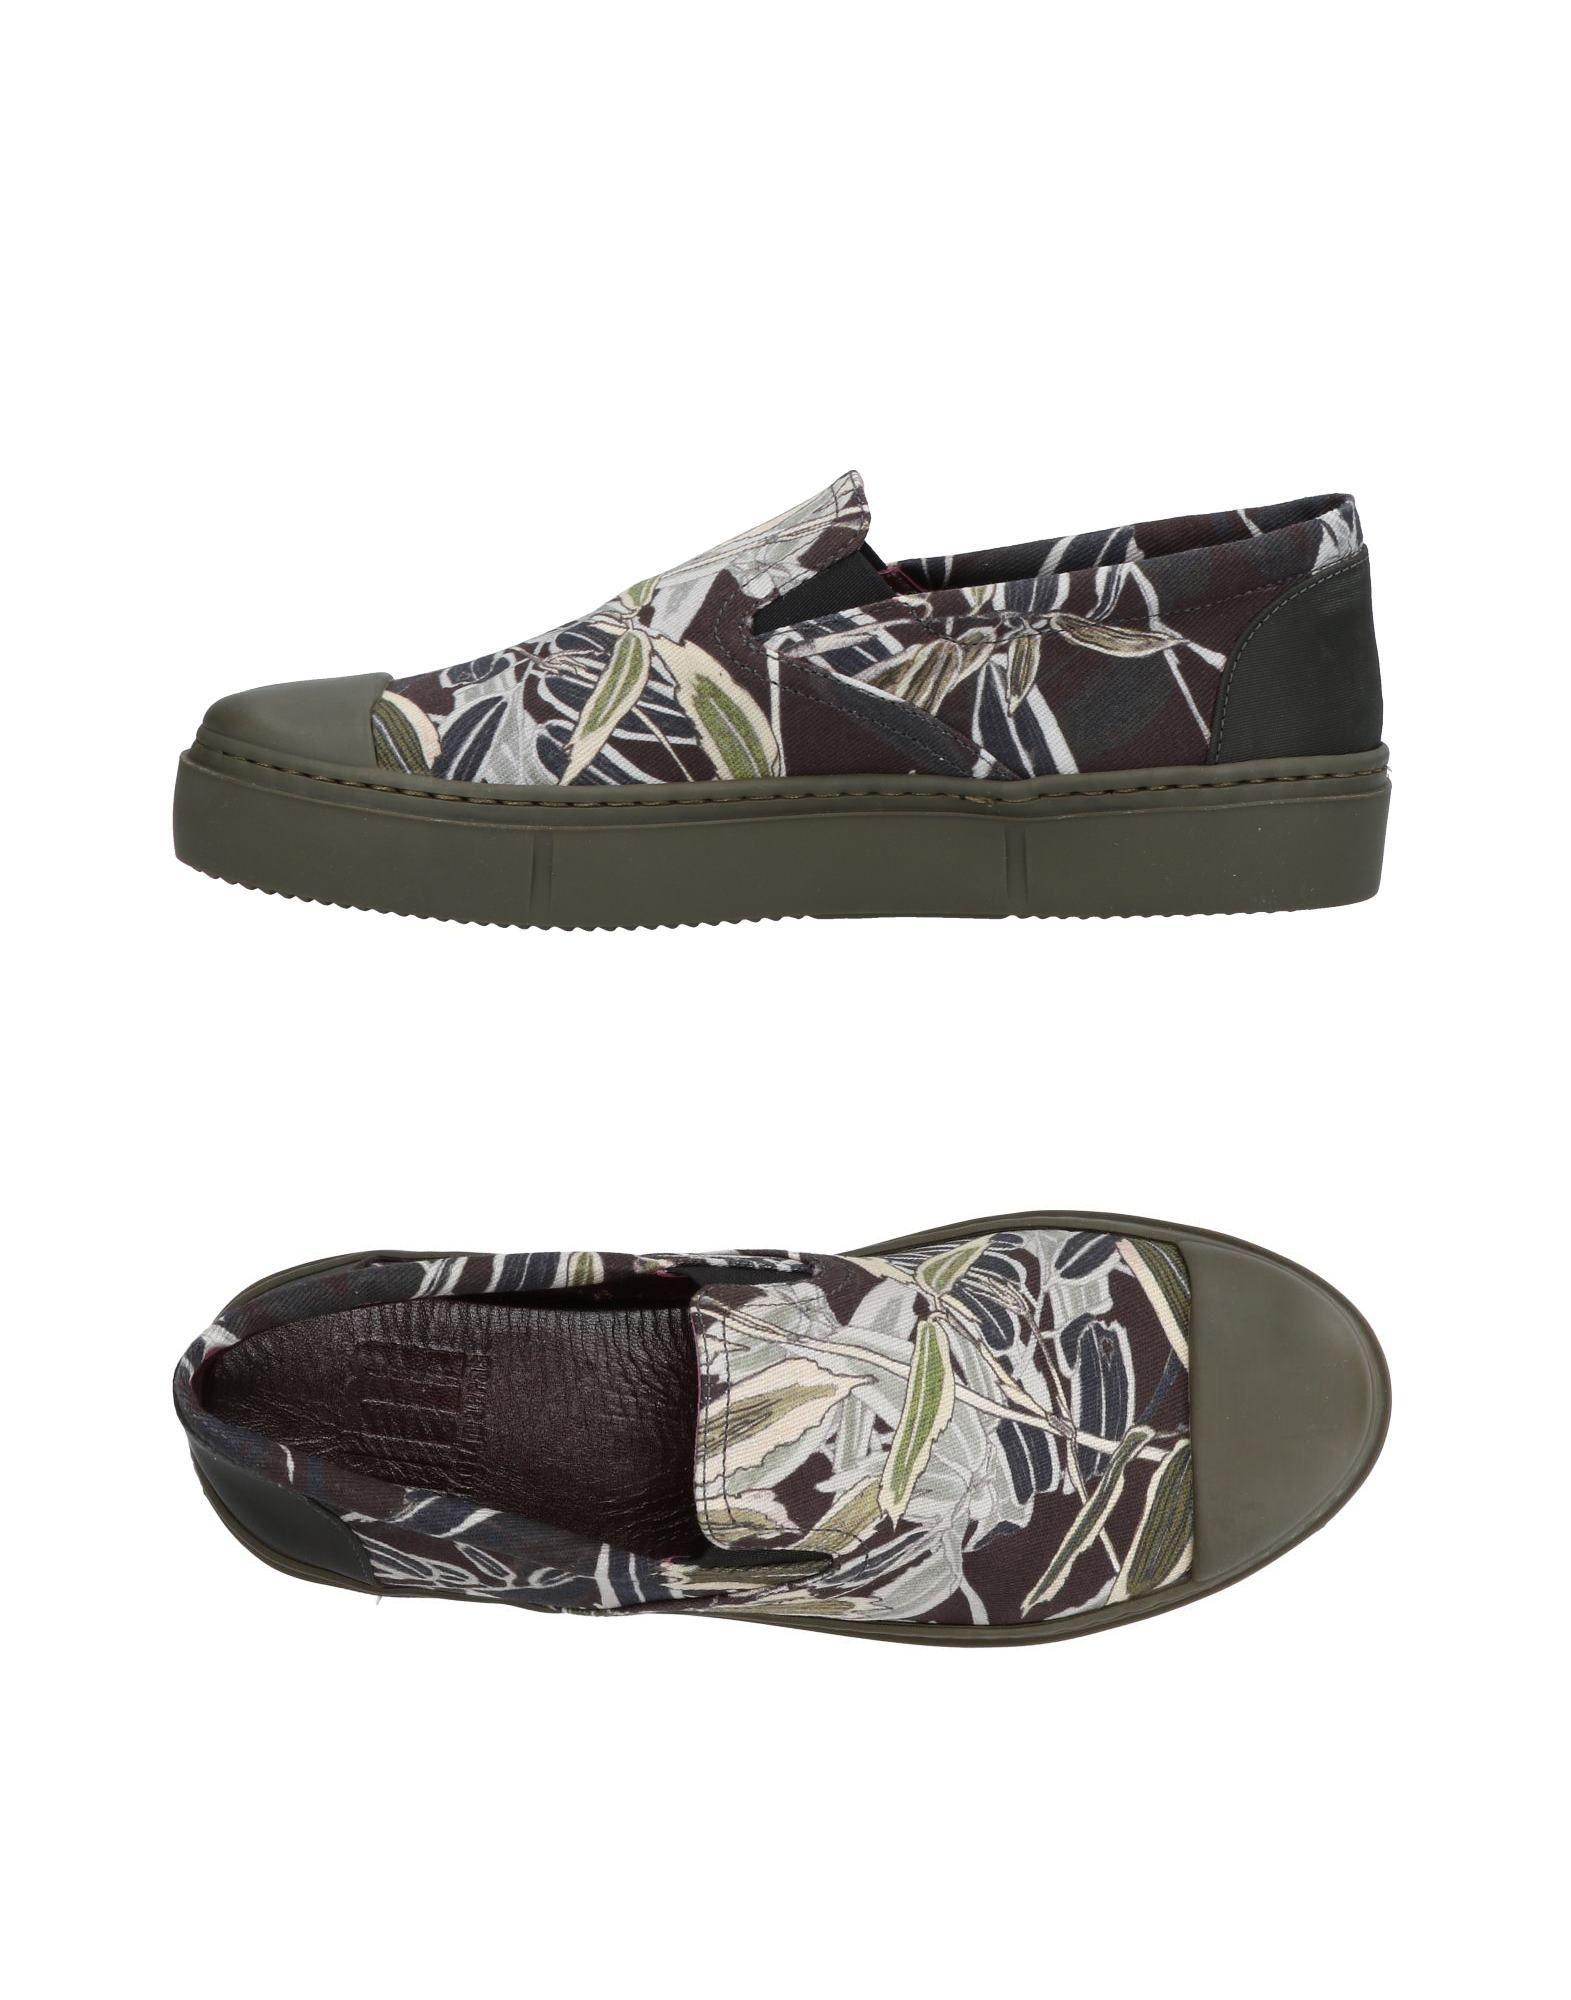 Sneakers Isola I'm Isola Sneakers Marras Donna - 11465702MA dd11e8